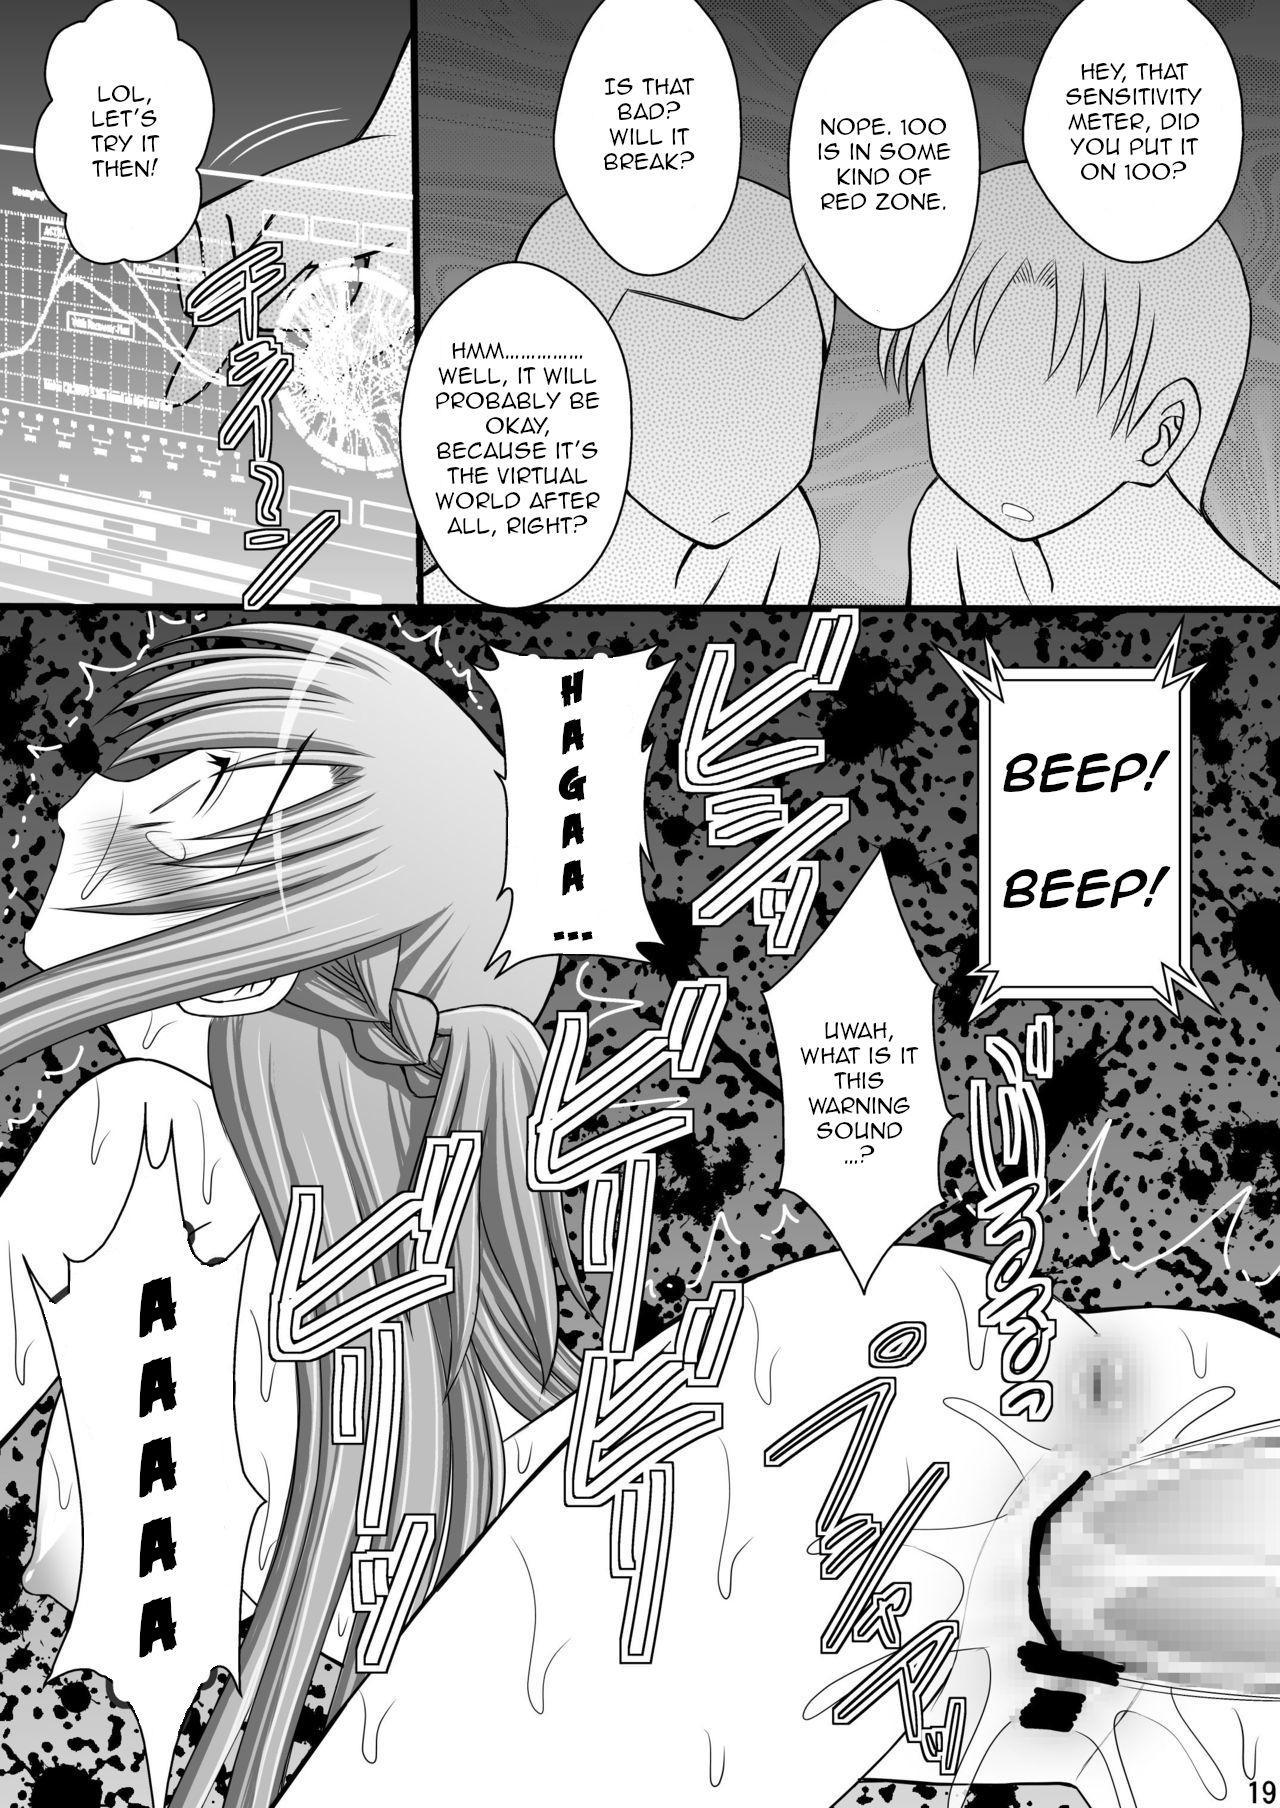 [Asanoya (Kittsu)] Toraware Hime III - Asuna Nakadashi 100-nin Dekiru ka na   Hostage Princess III (Sword Art Online) [English] [HypnoMangaEditor] [Digital] 17